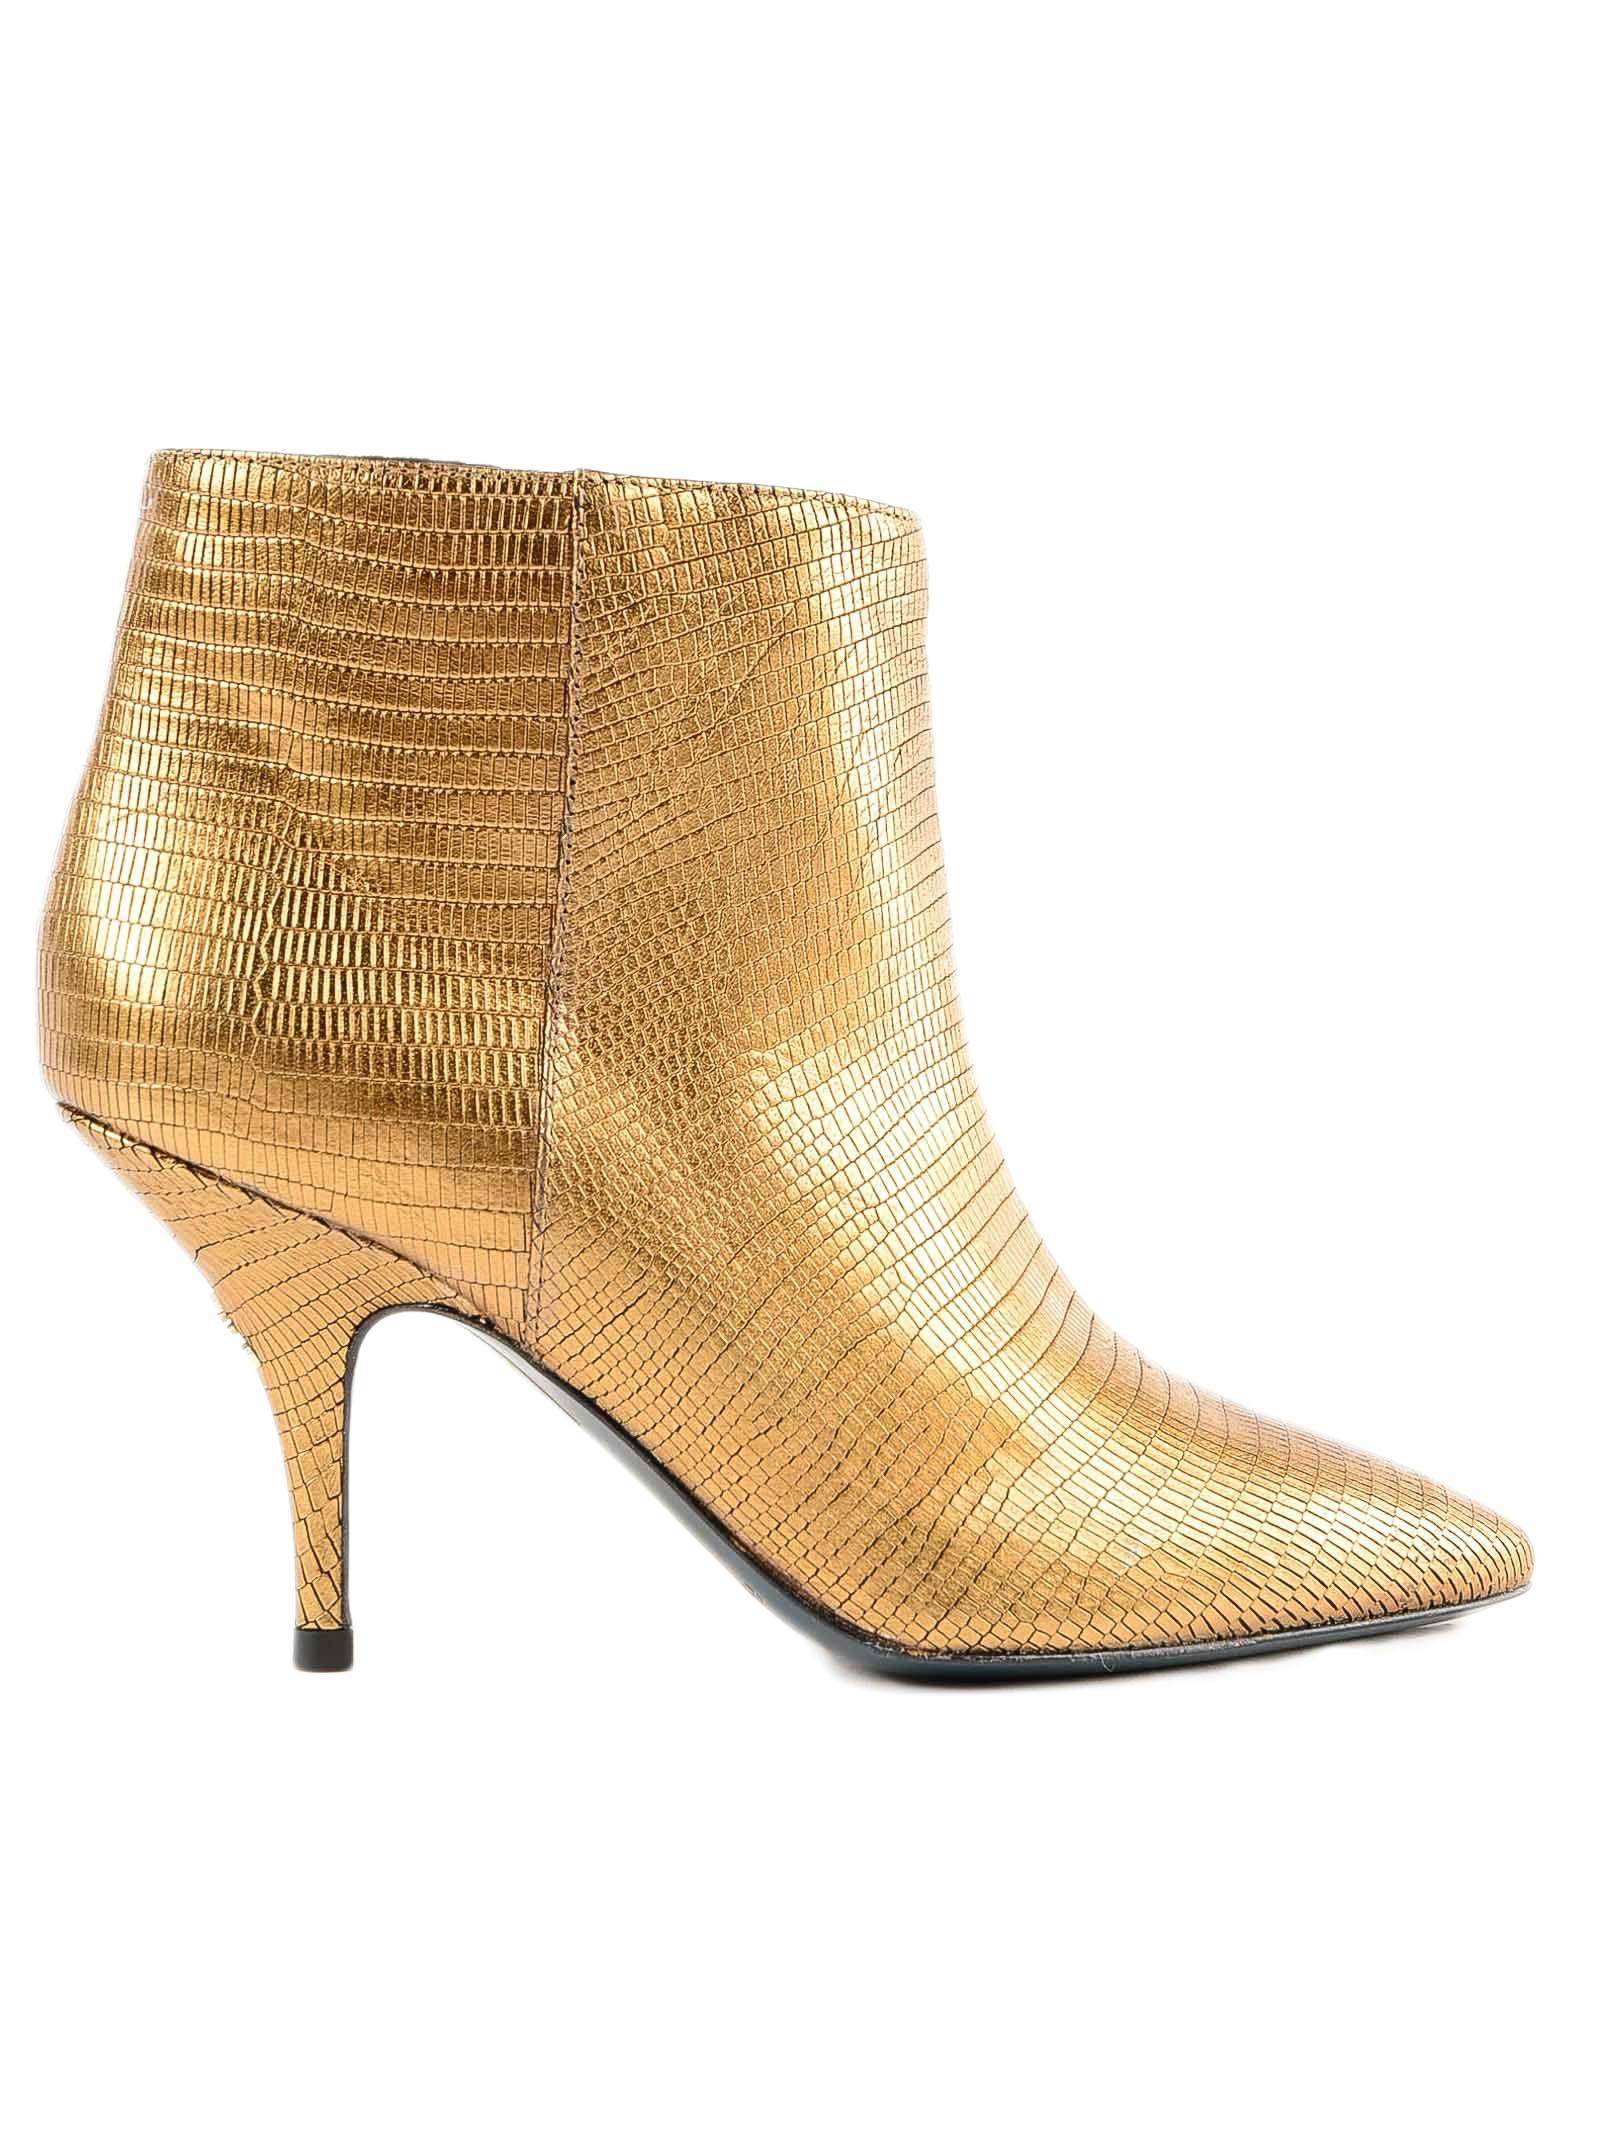 Patrizia Pepe Pointed Toe Boots